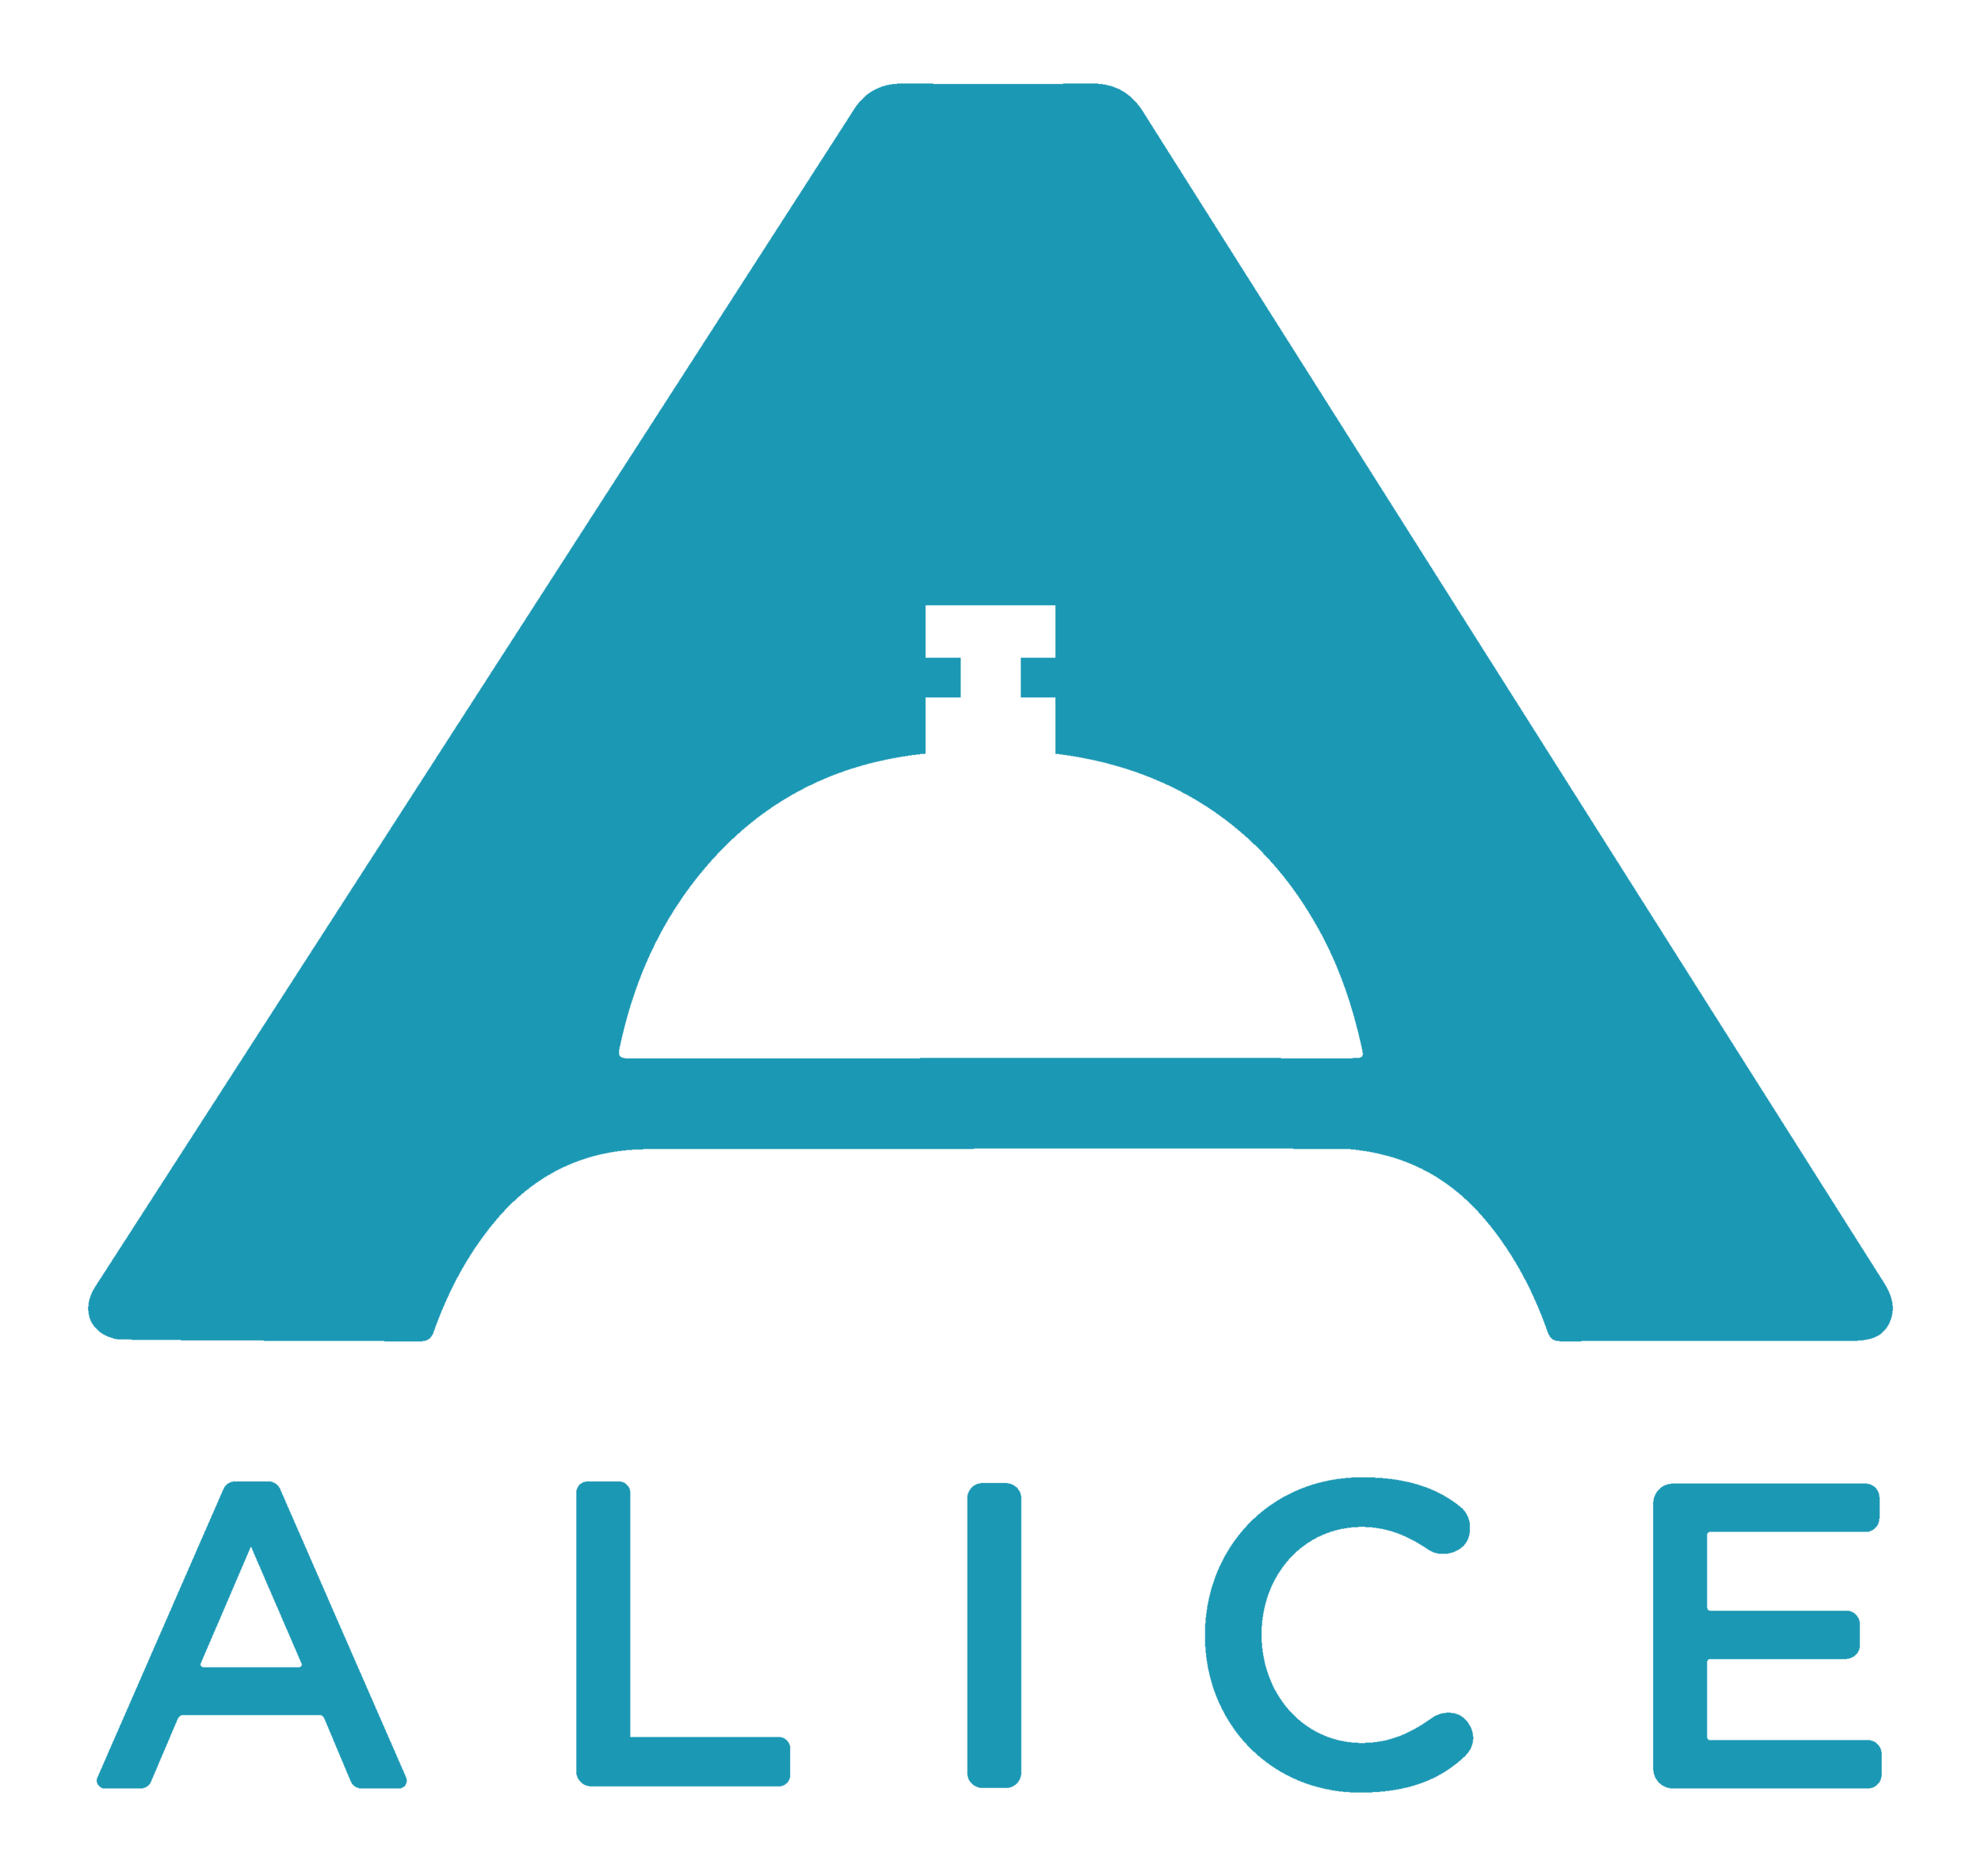 alice-logo-blue_high.png